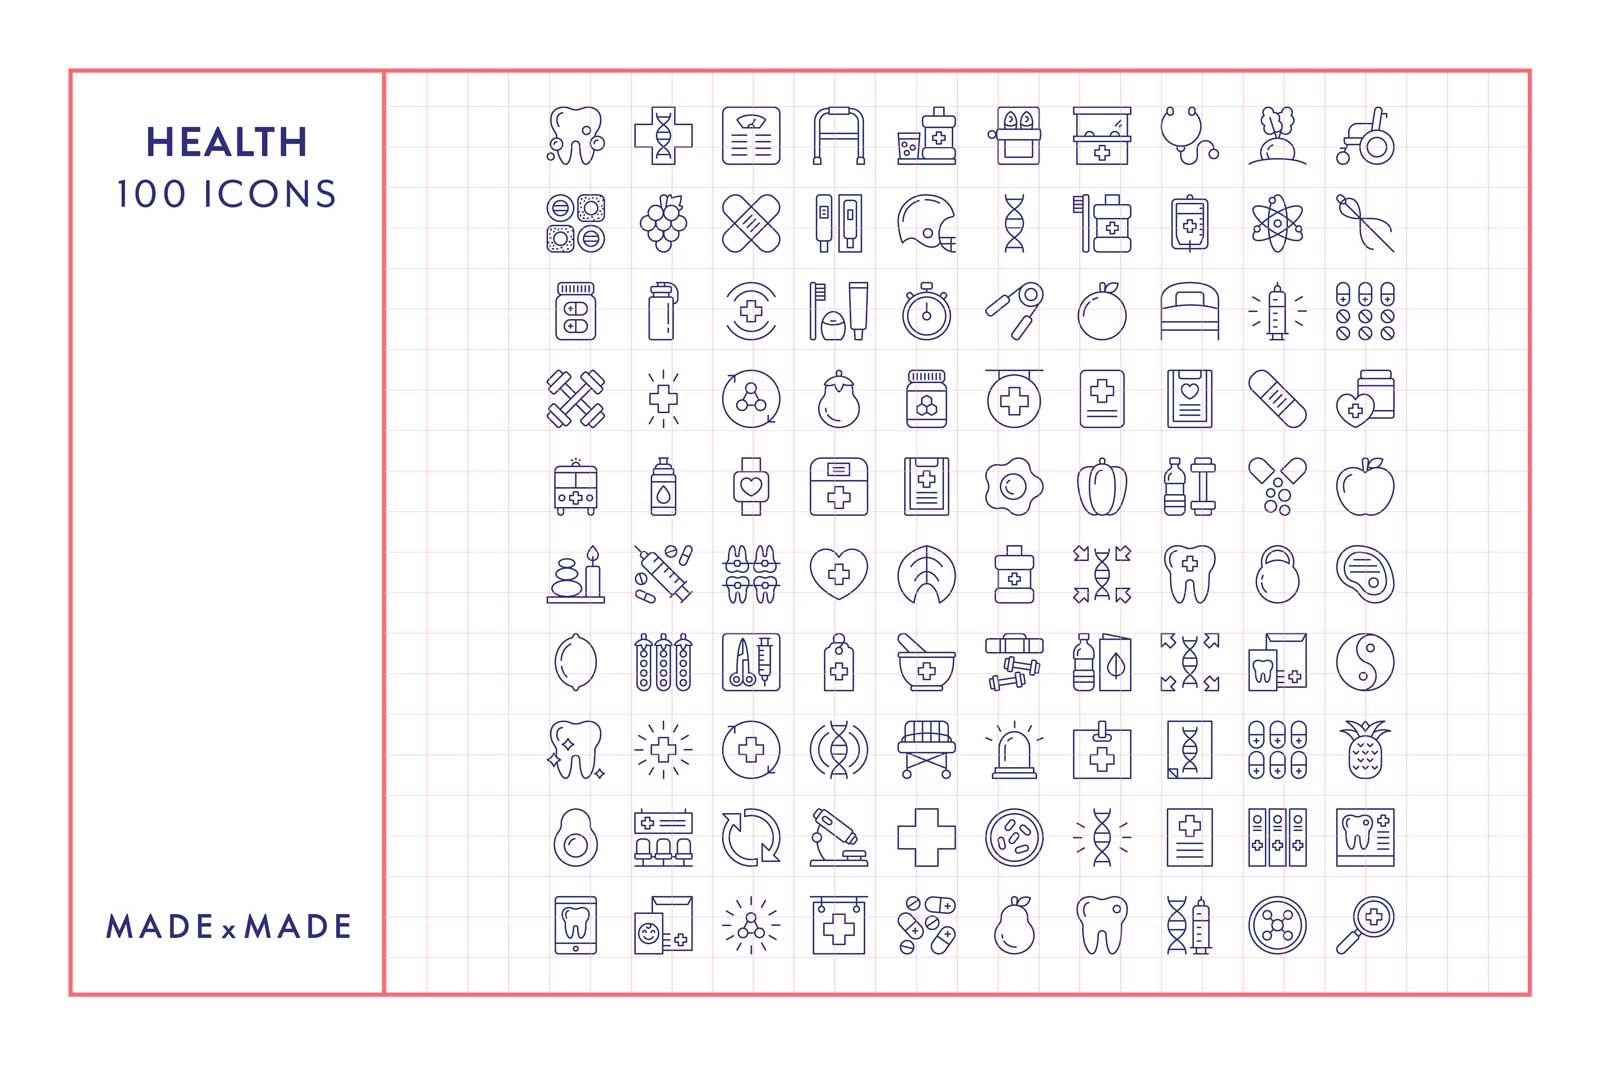 made x made icons health